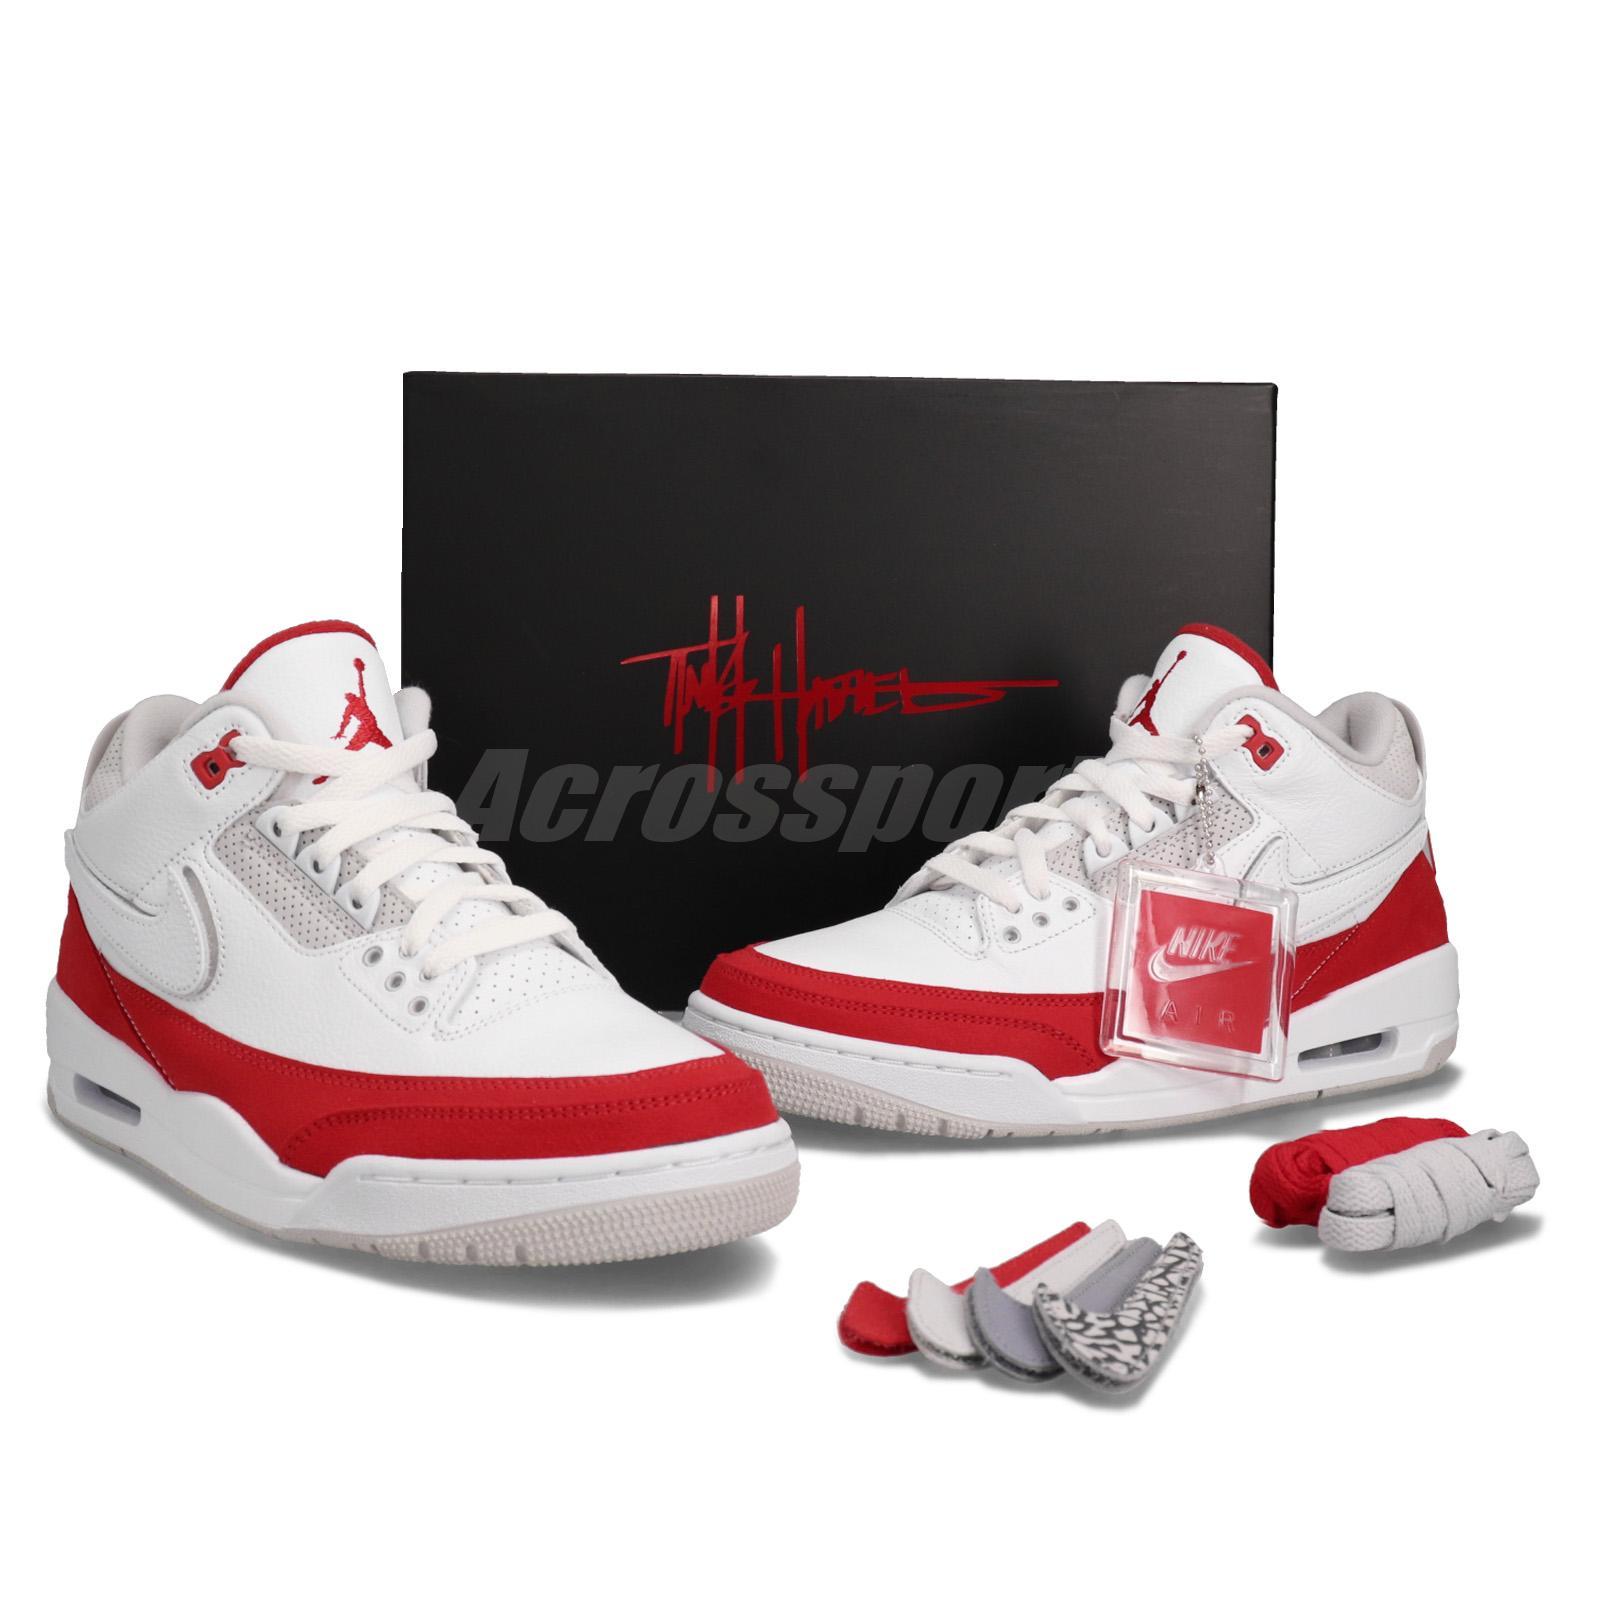 best service 0e4b7 f0628 Details about Nike Air Jordan 3 Retro TH SP Tinker Hatfield Air Max 1 OG  Red White CJ0939-100